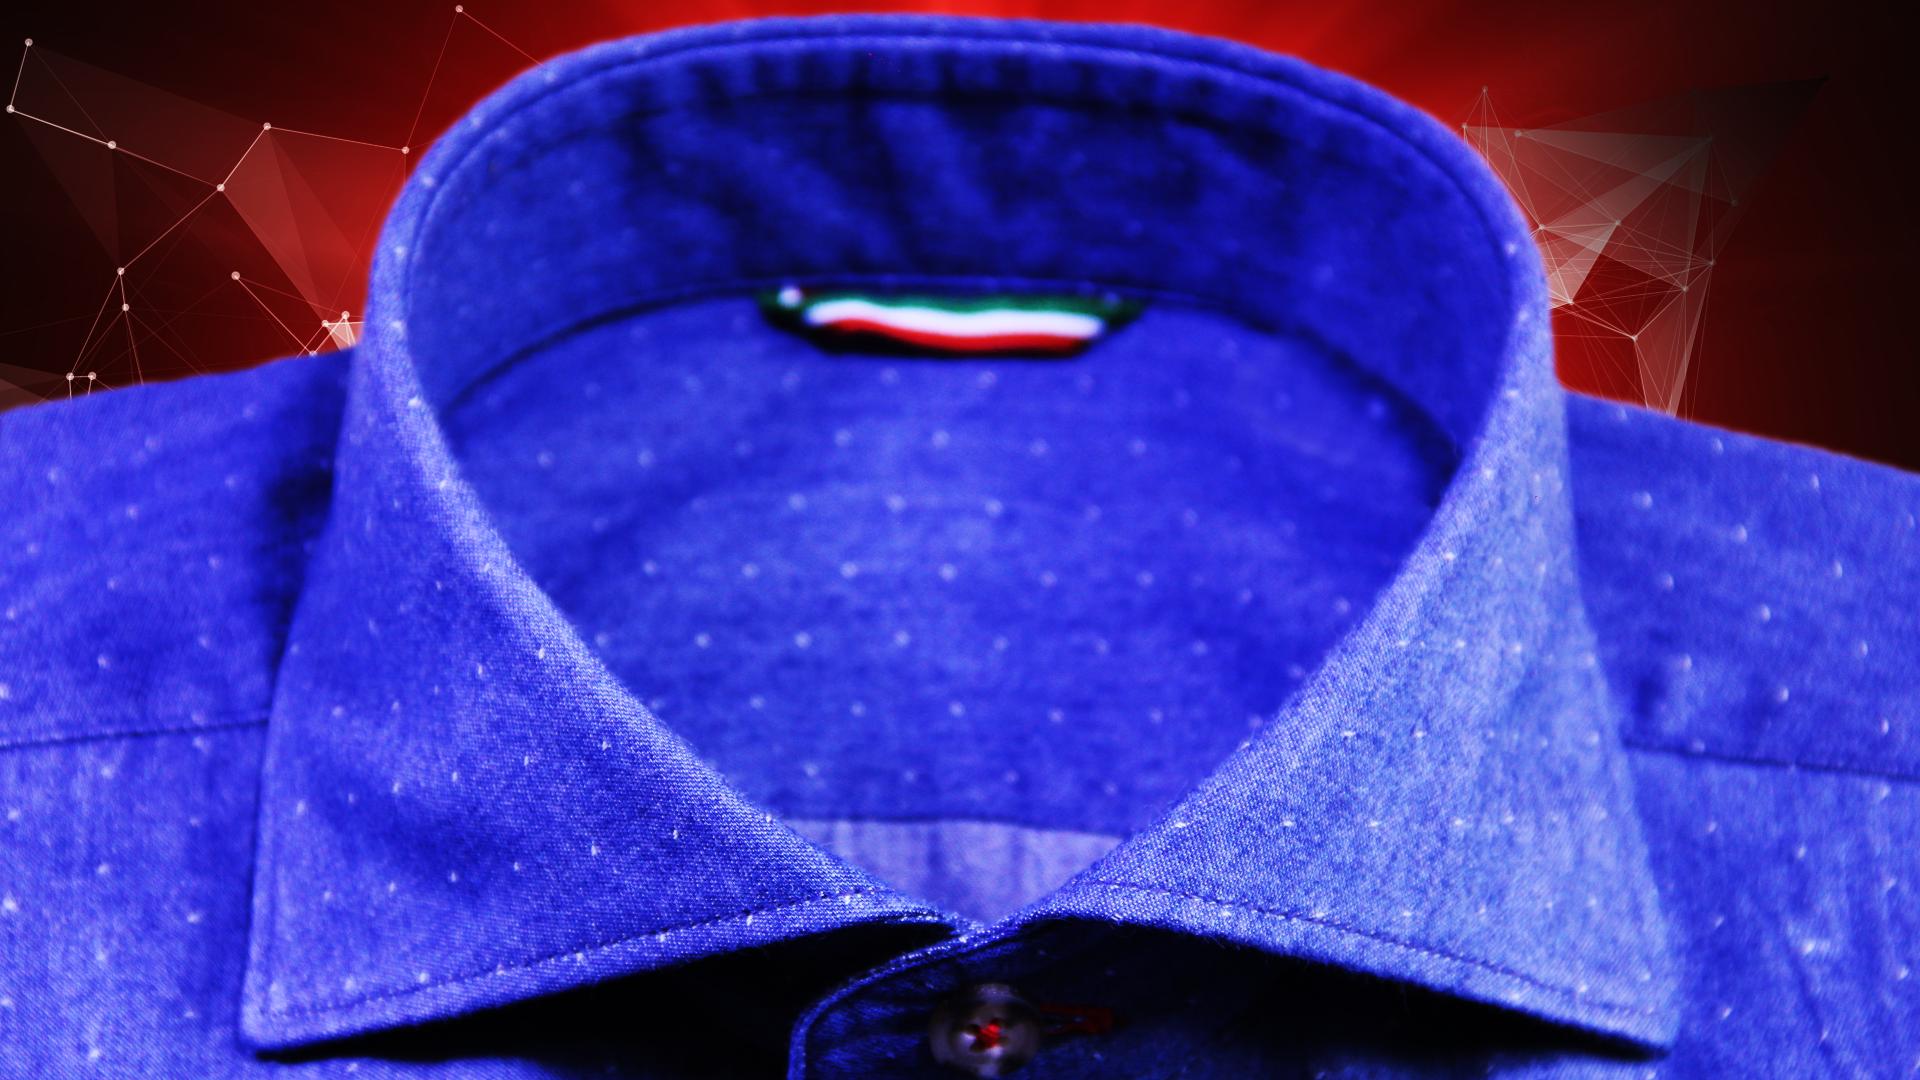 Pois dress shirt